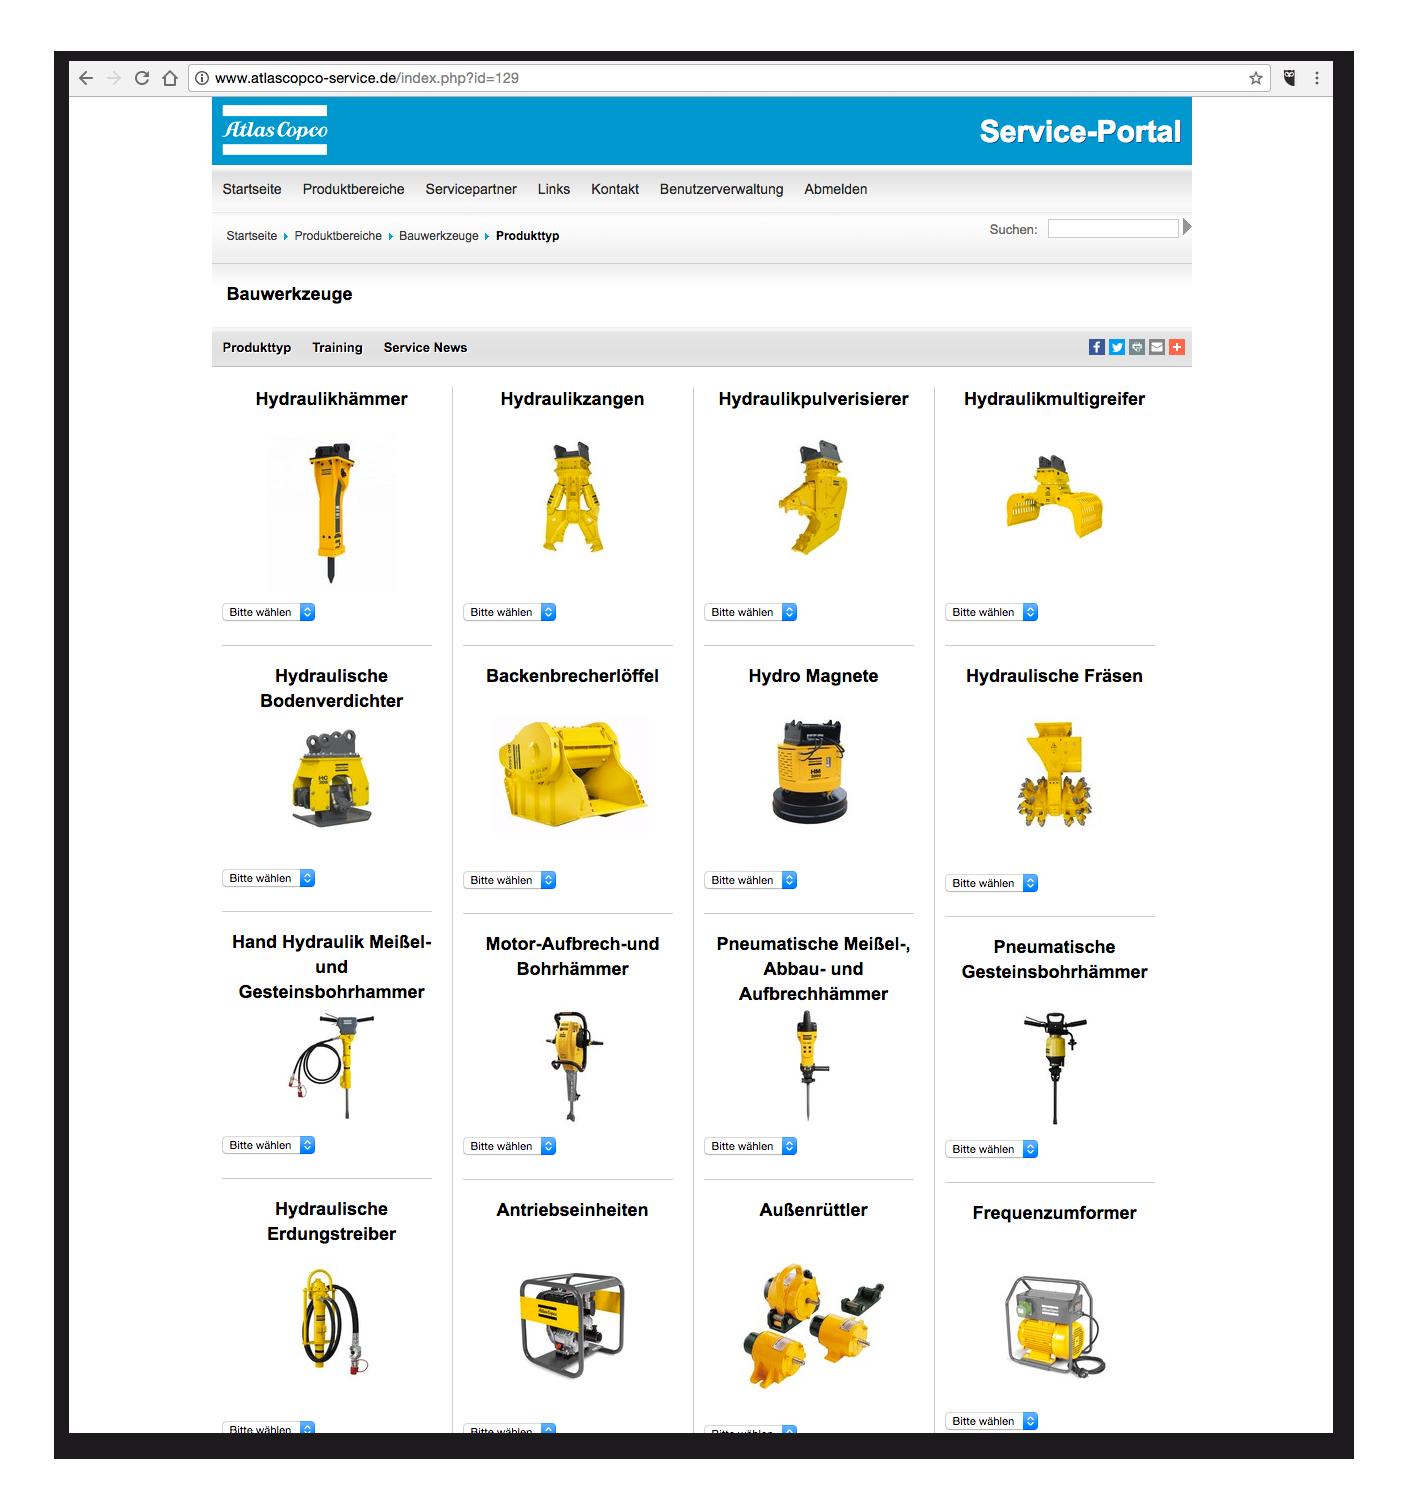 AtslasCopco-Service - Bauwerkzeuge